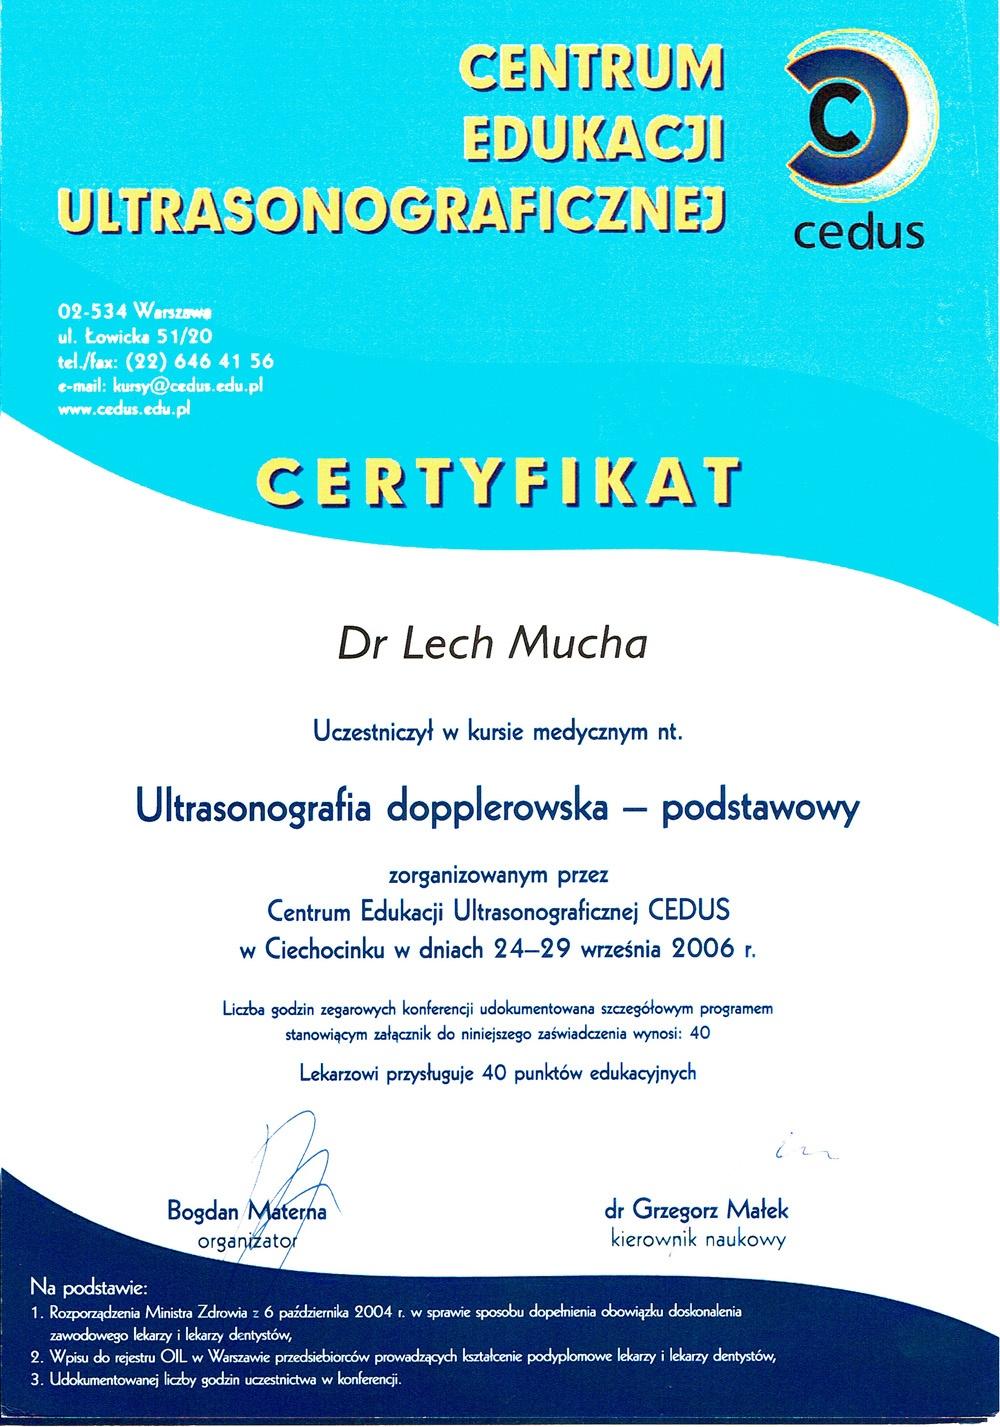 2006_09_24-29_lech_mucha_chiruria_zyl